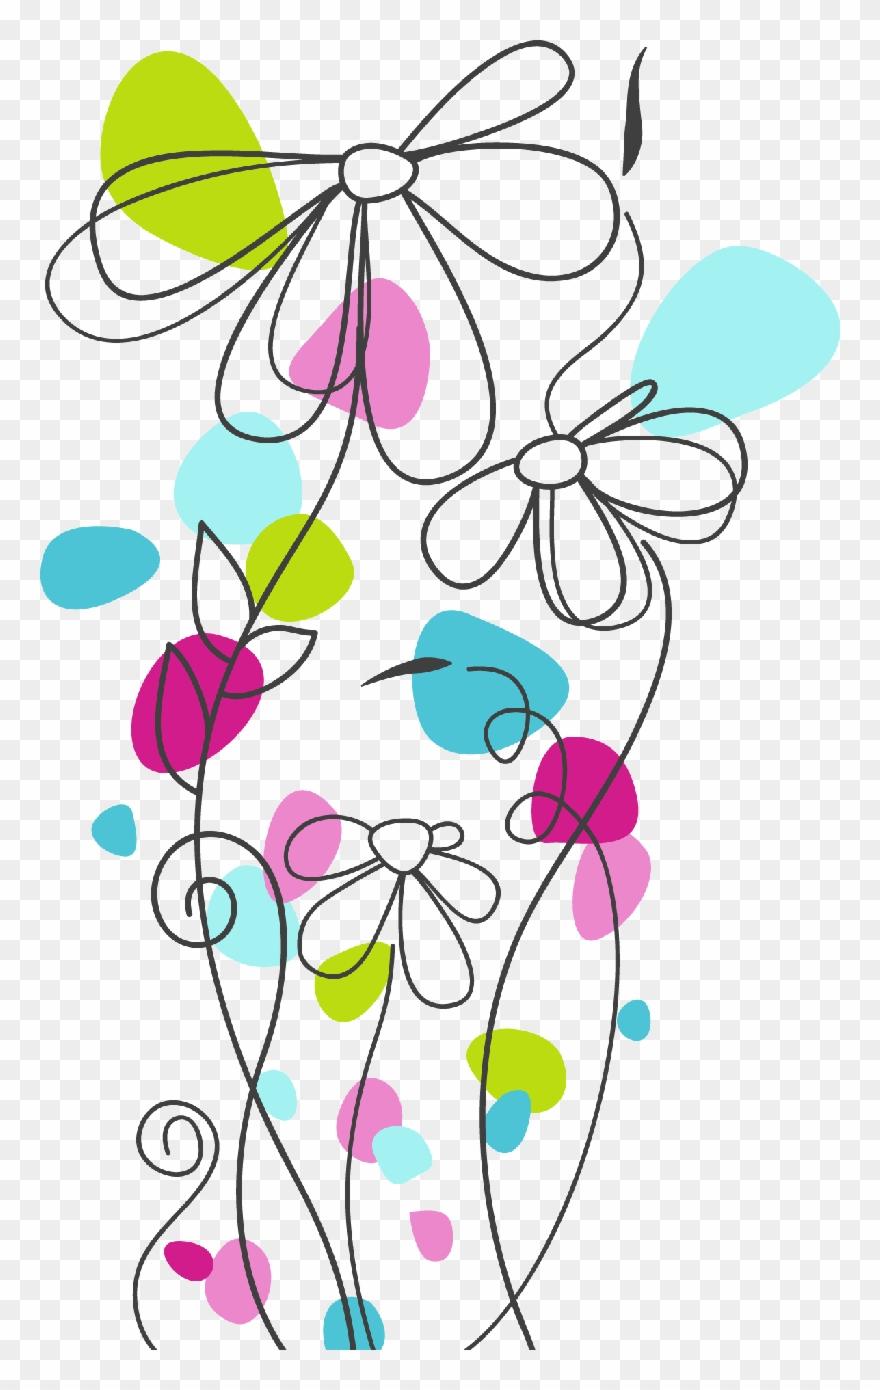 medium resolution of free motion embroidery vector de flores animadas png clipart